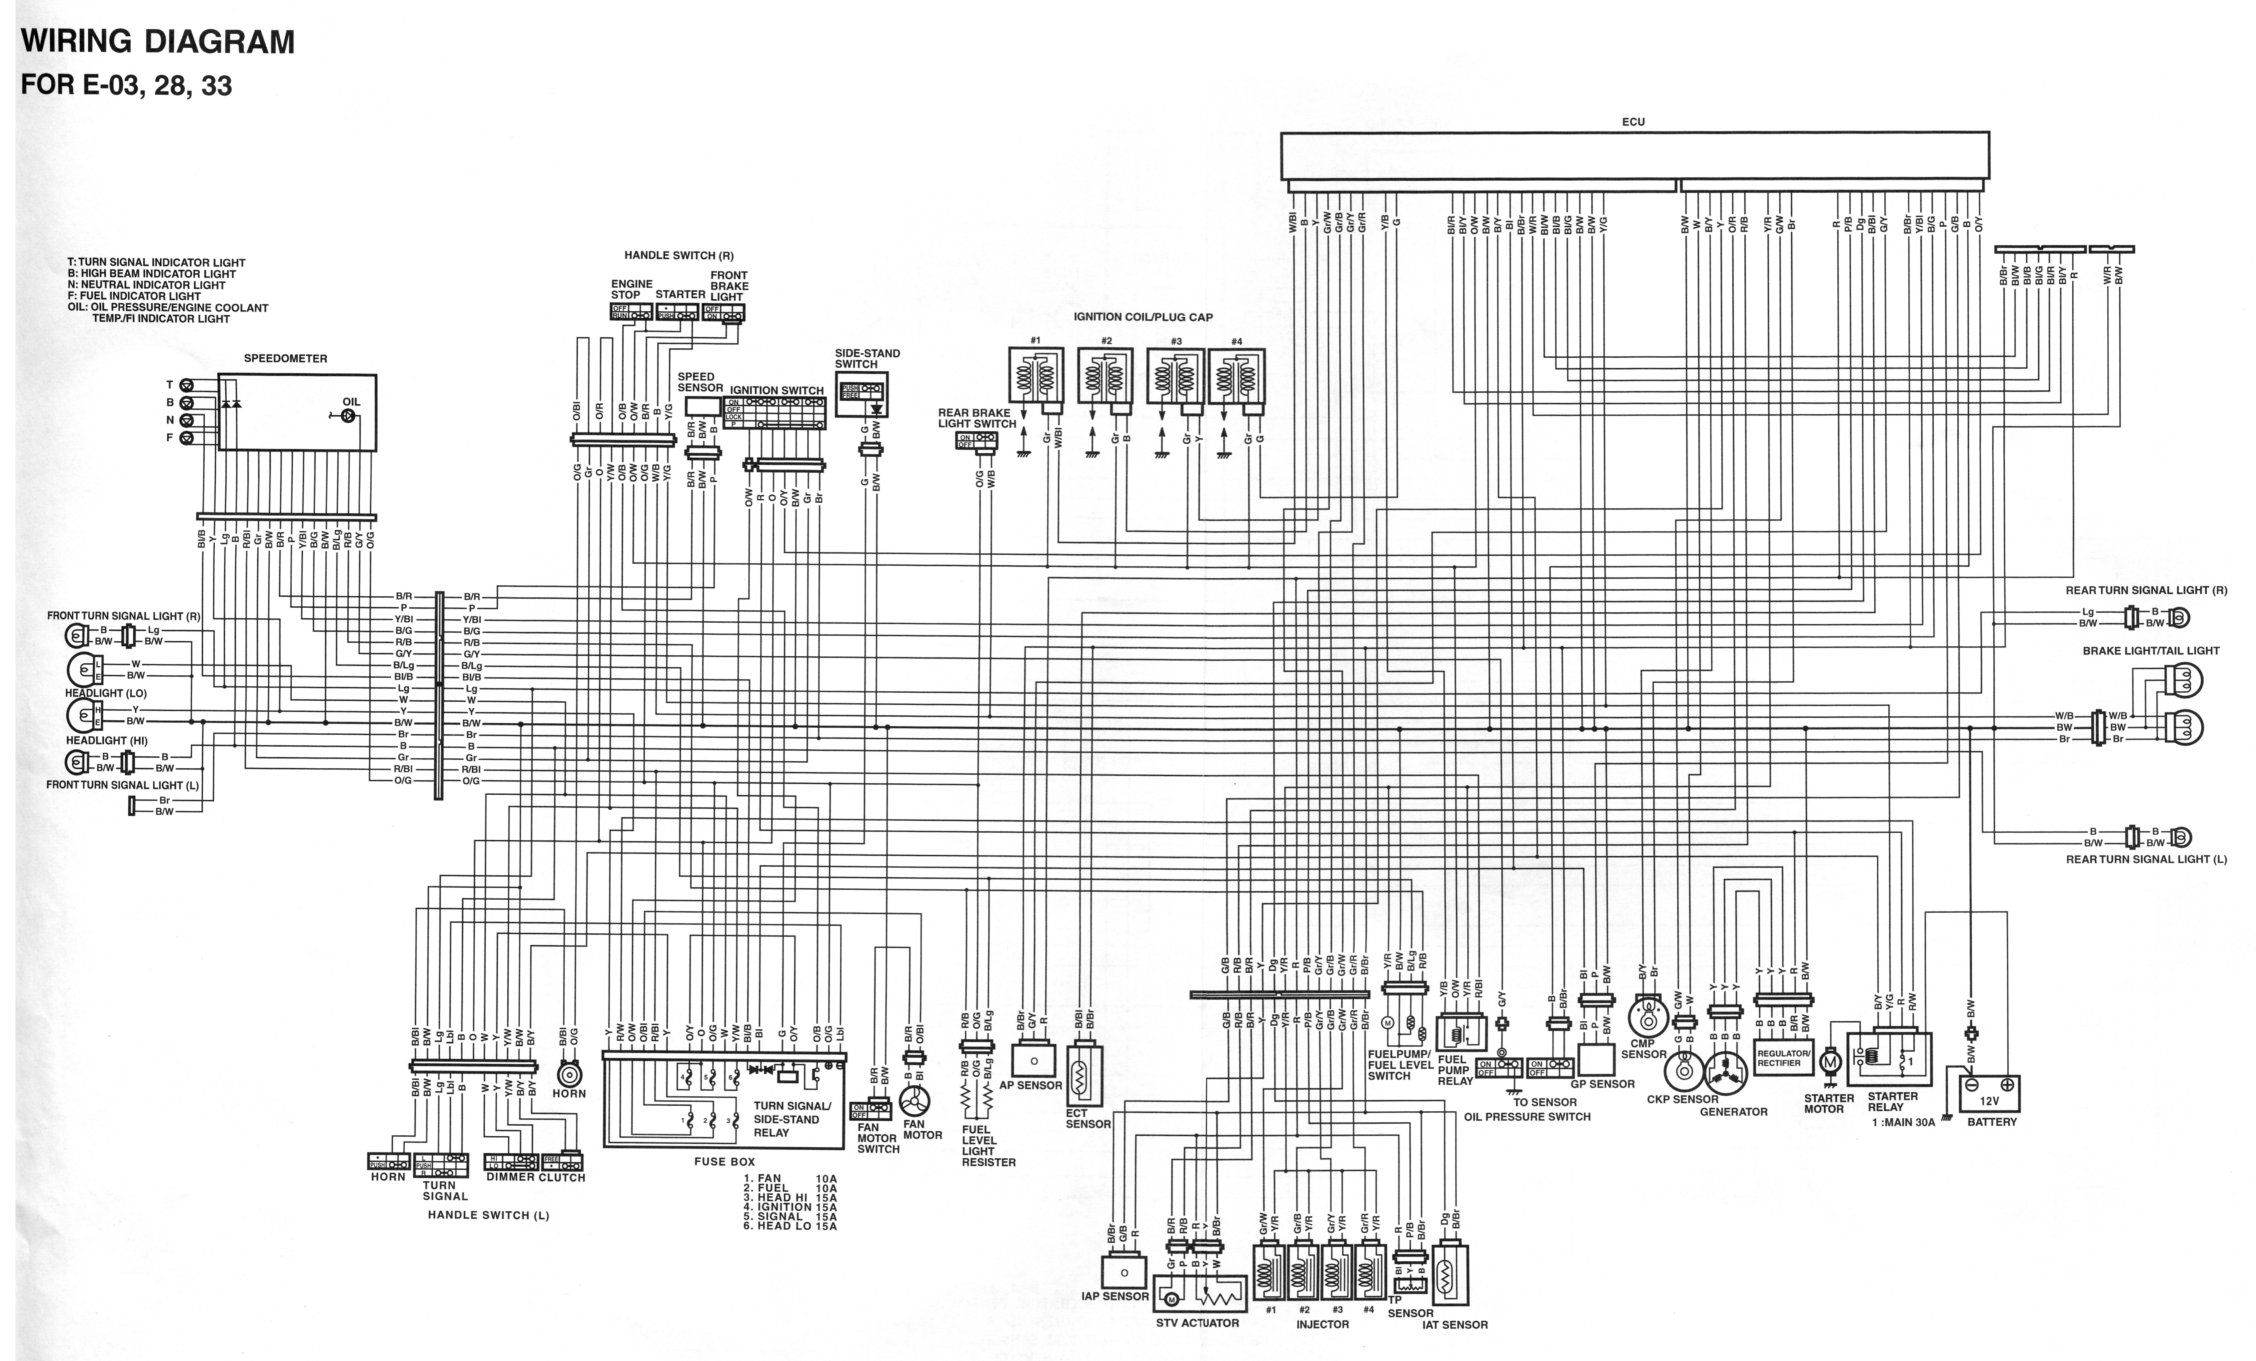 2002 Suzuki Gsxr 750 Wiring Diagram from static-cdn.imageservice.cloud